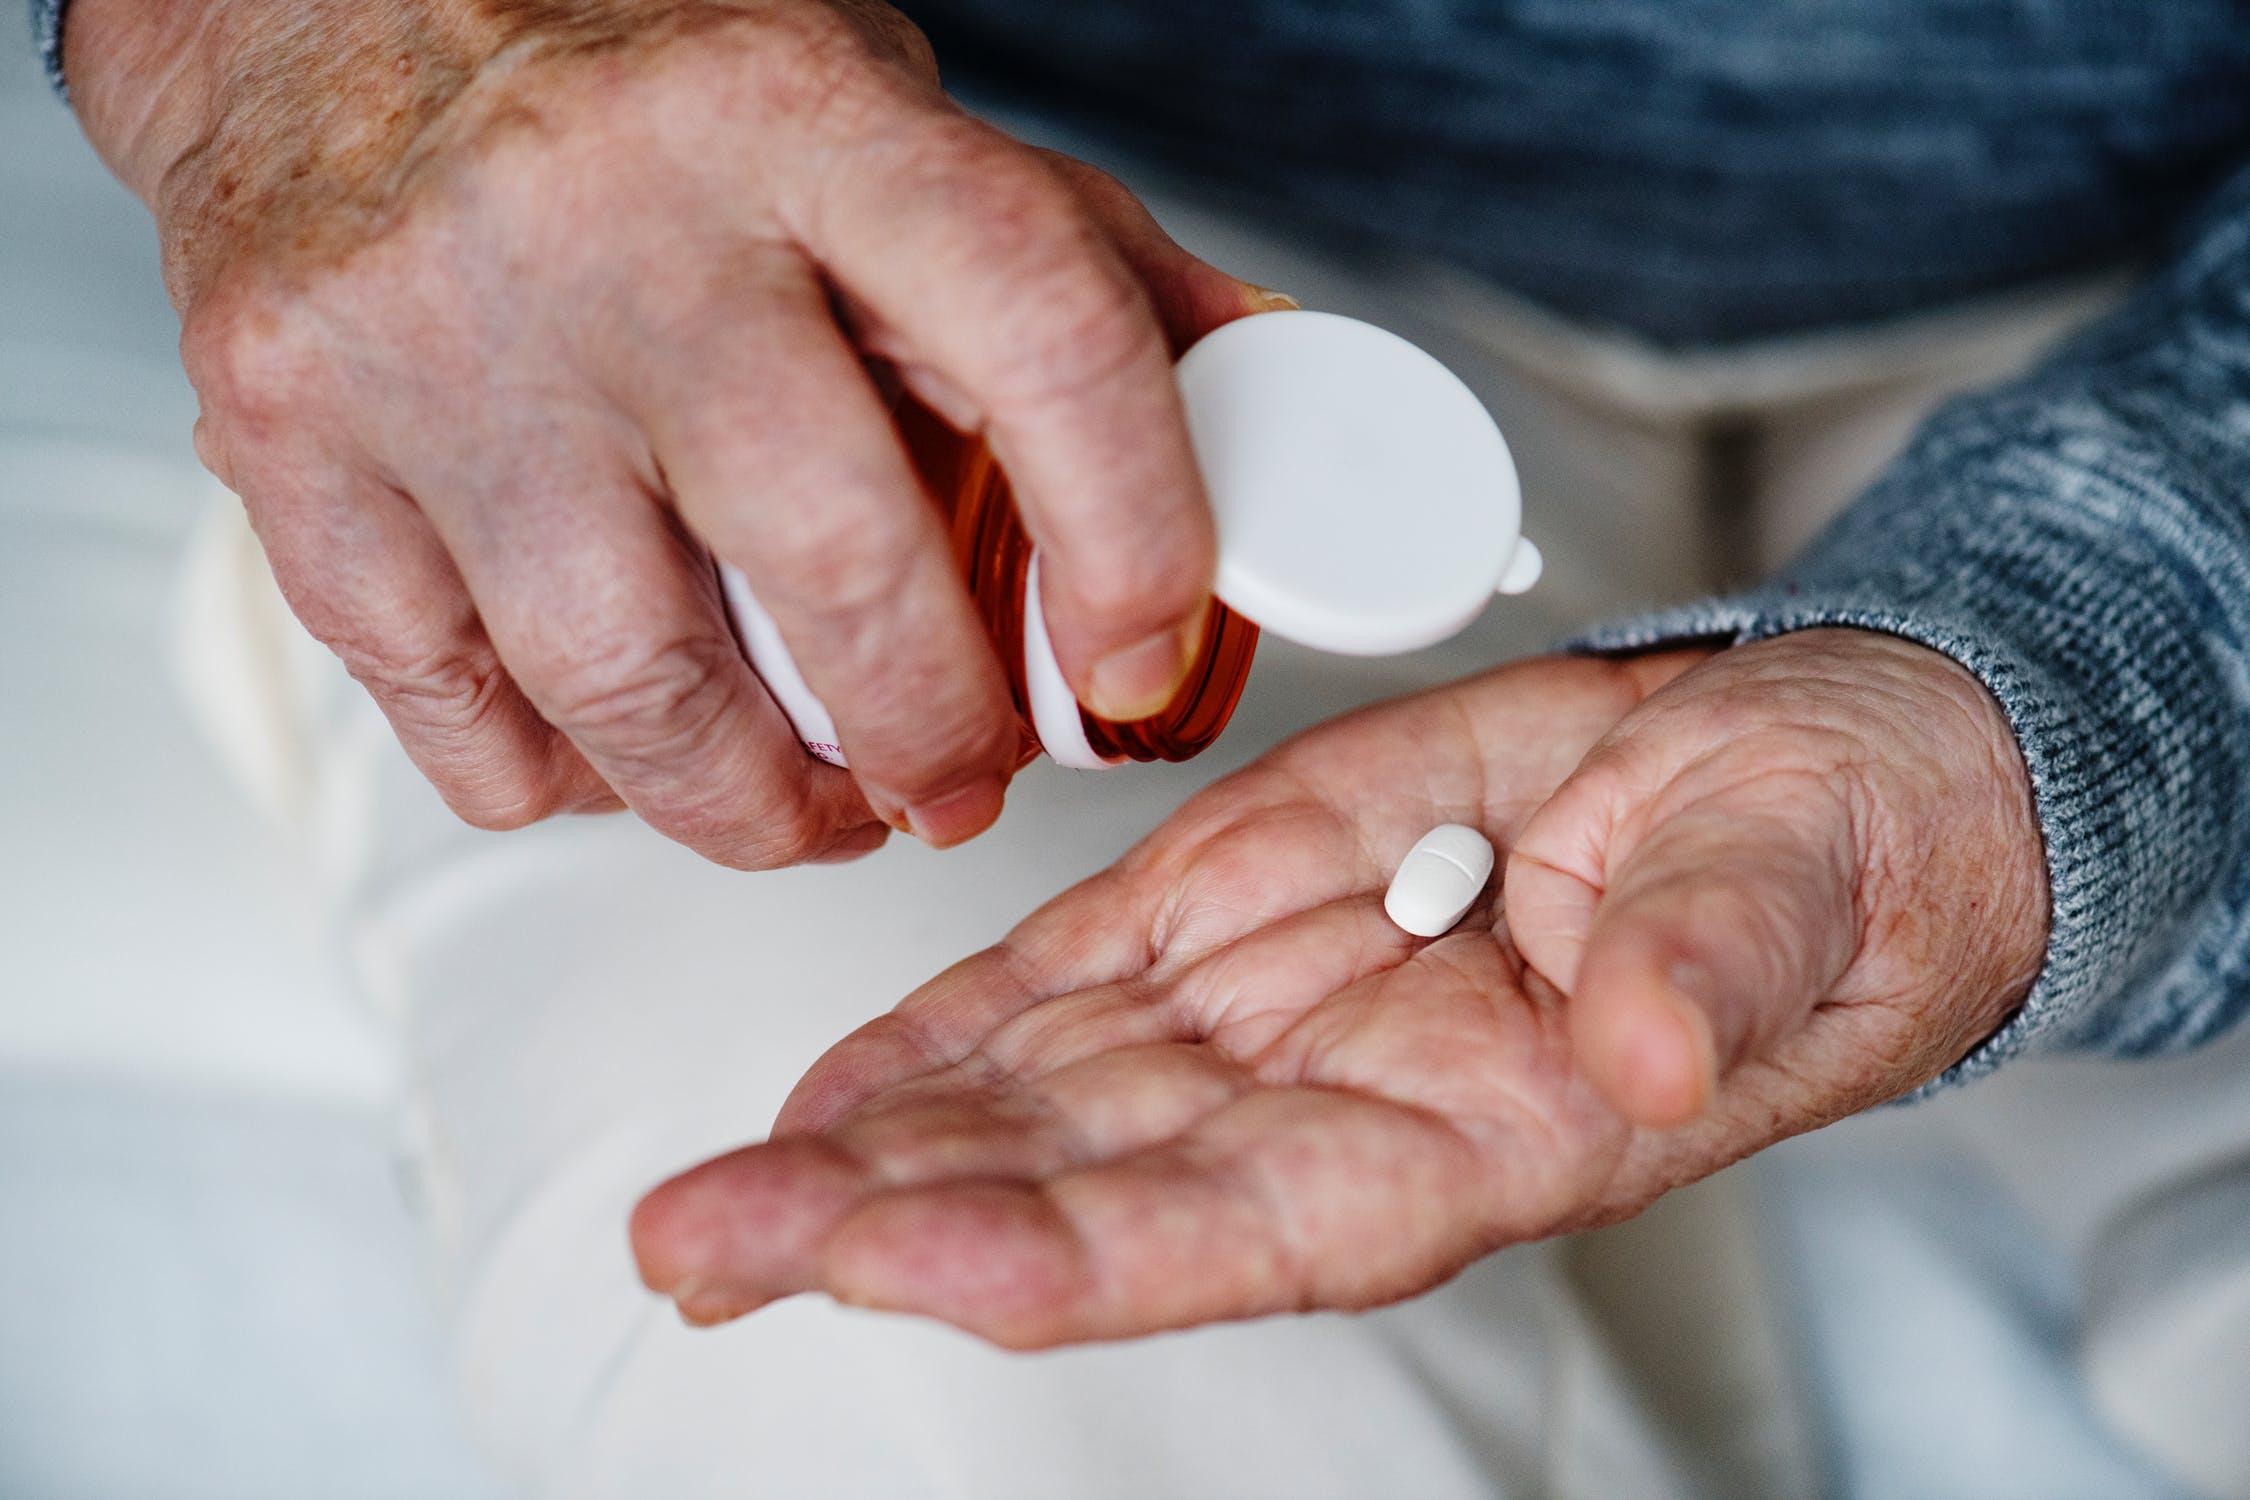 Infectie & Antibiotica